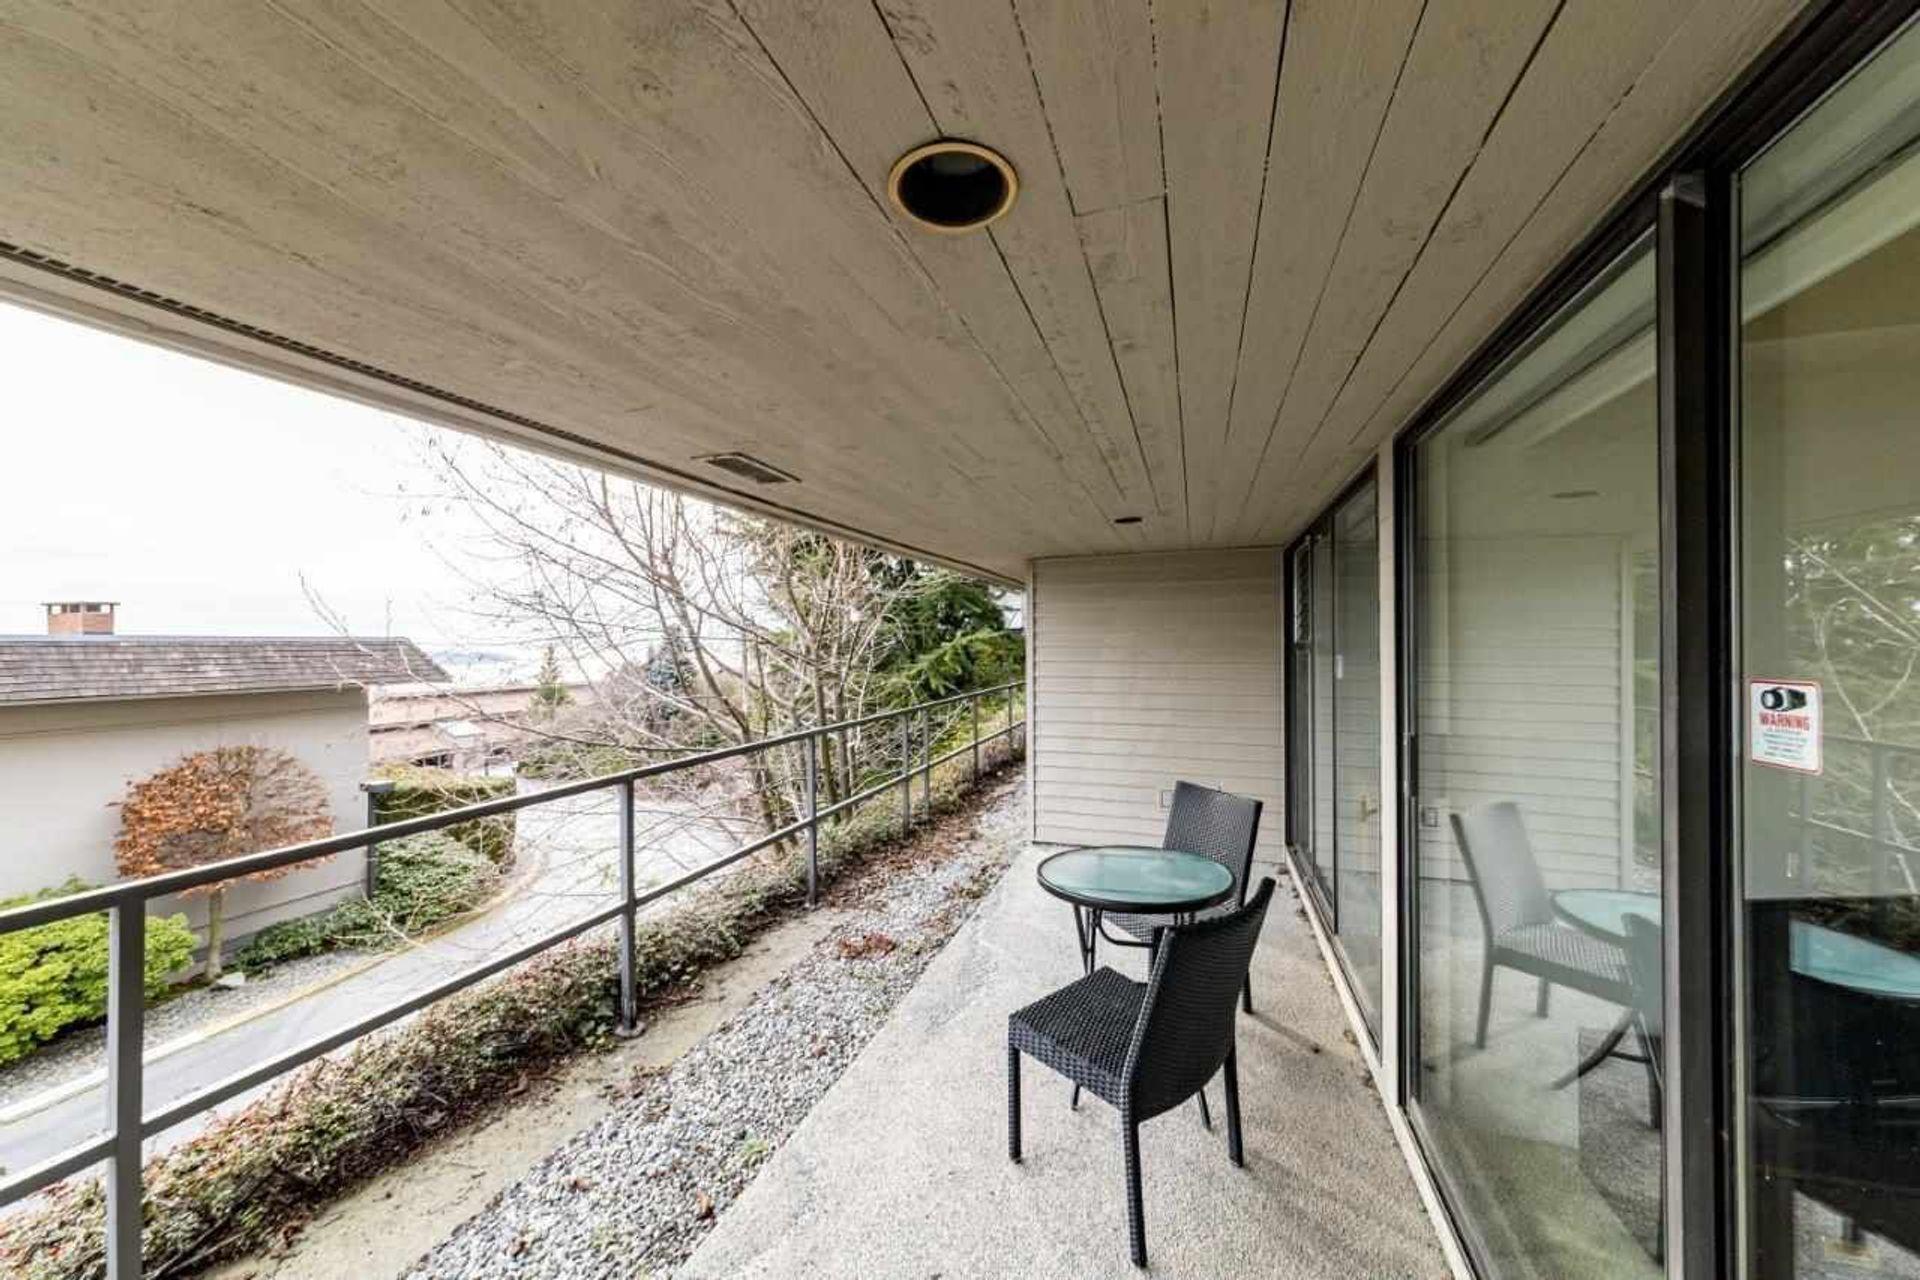 2250-folkestone-way-panorama-village-west-vancouver-37 at 21 - 2250 Folkestone Way, Panorama Village, West Vancouver